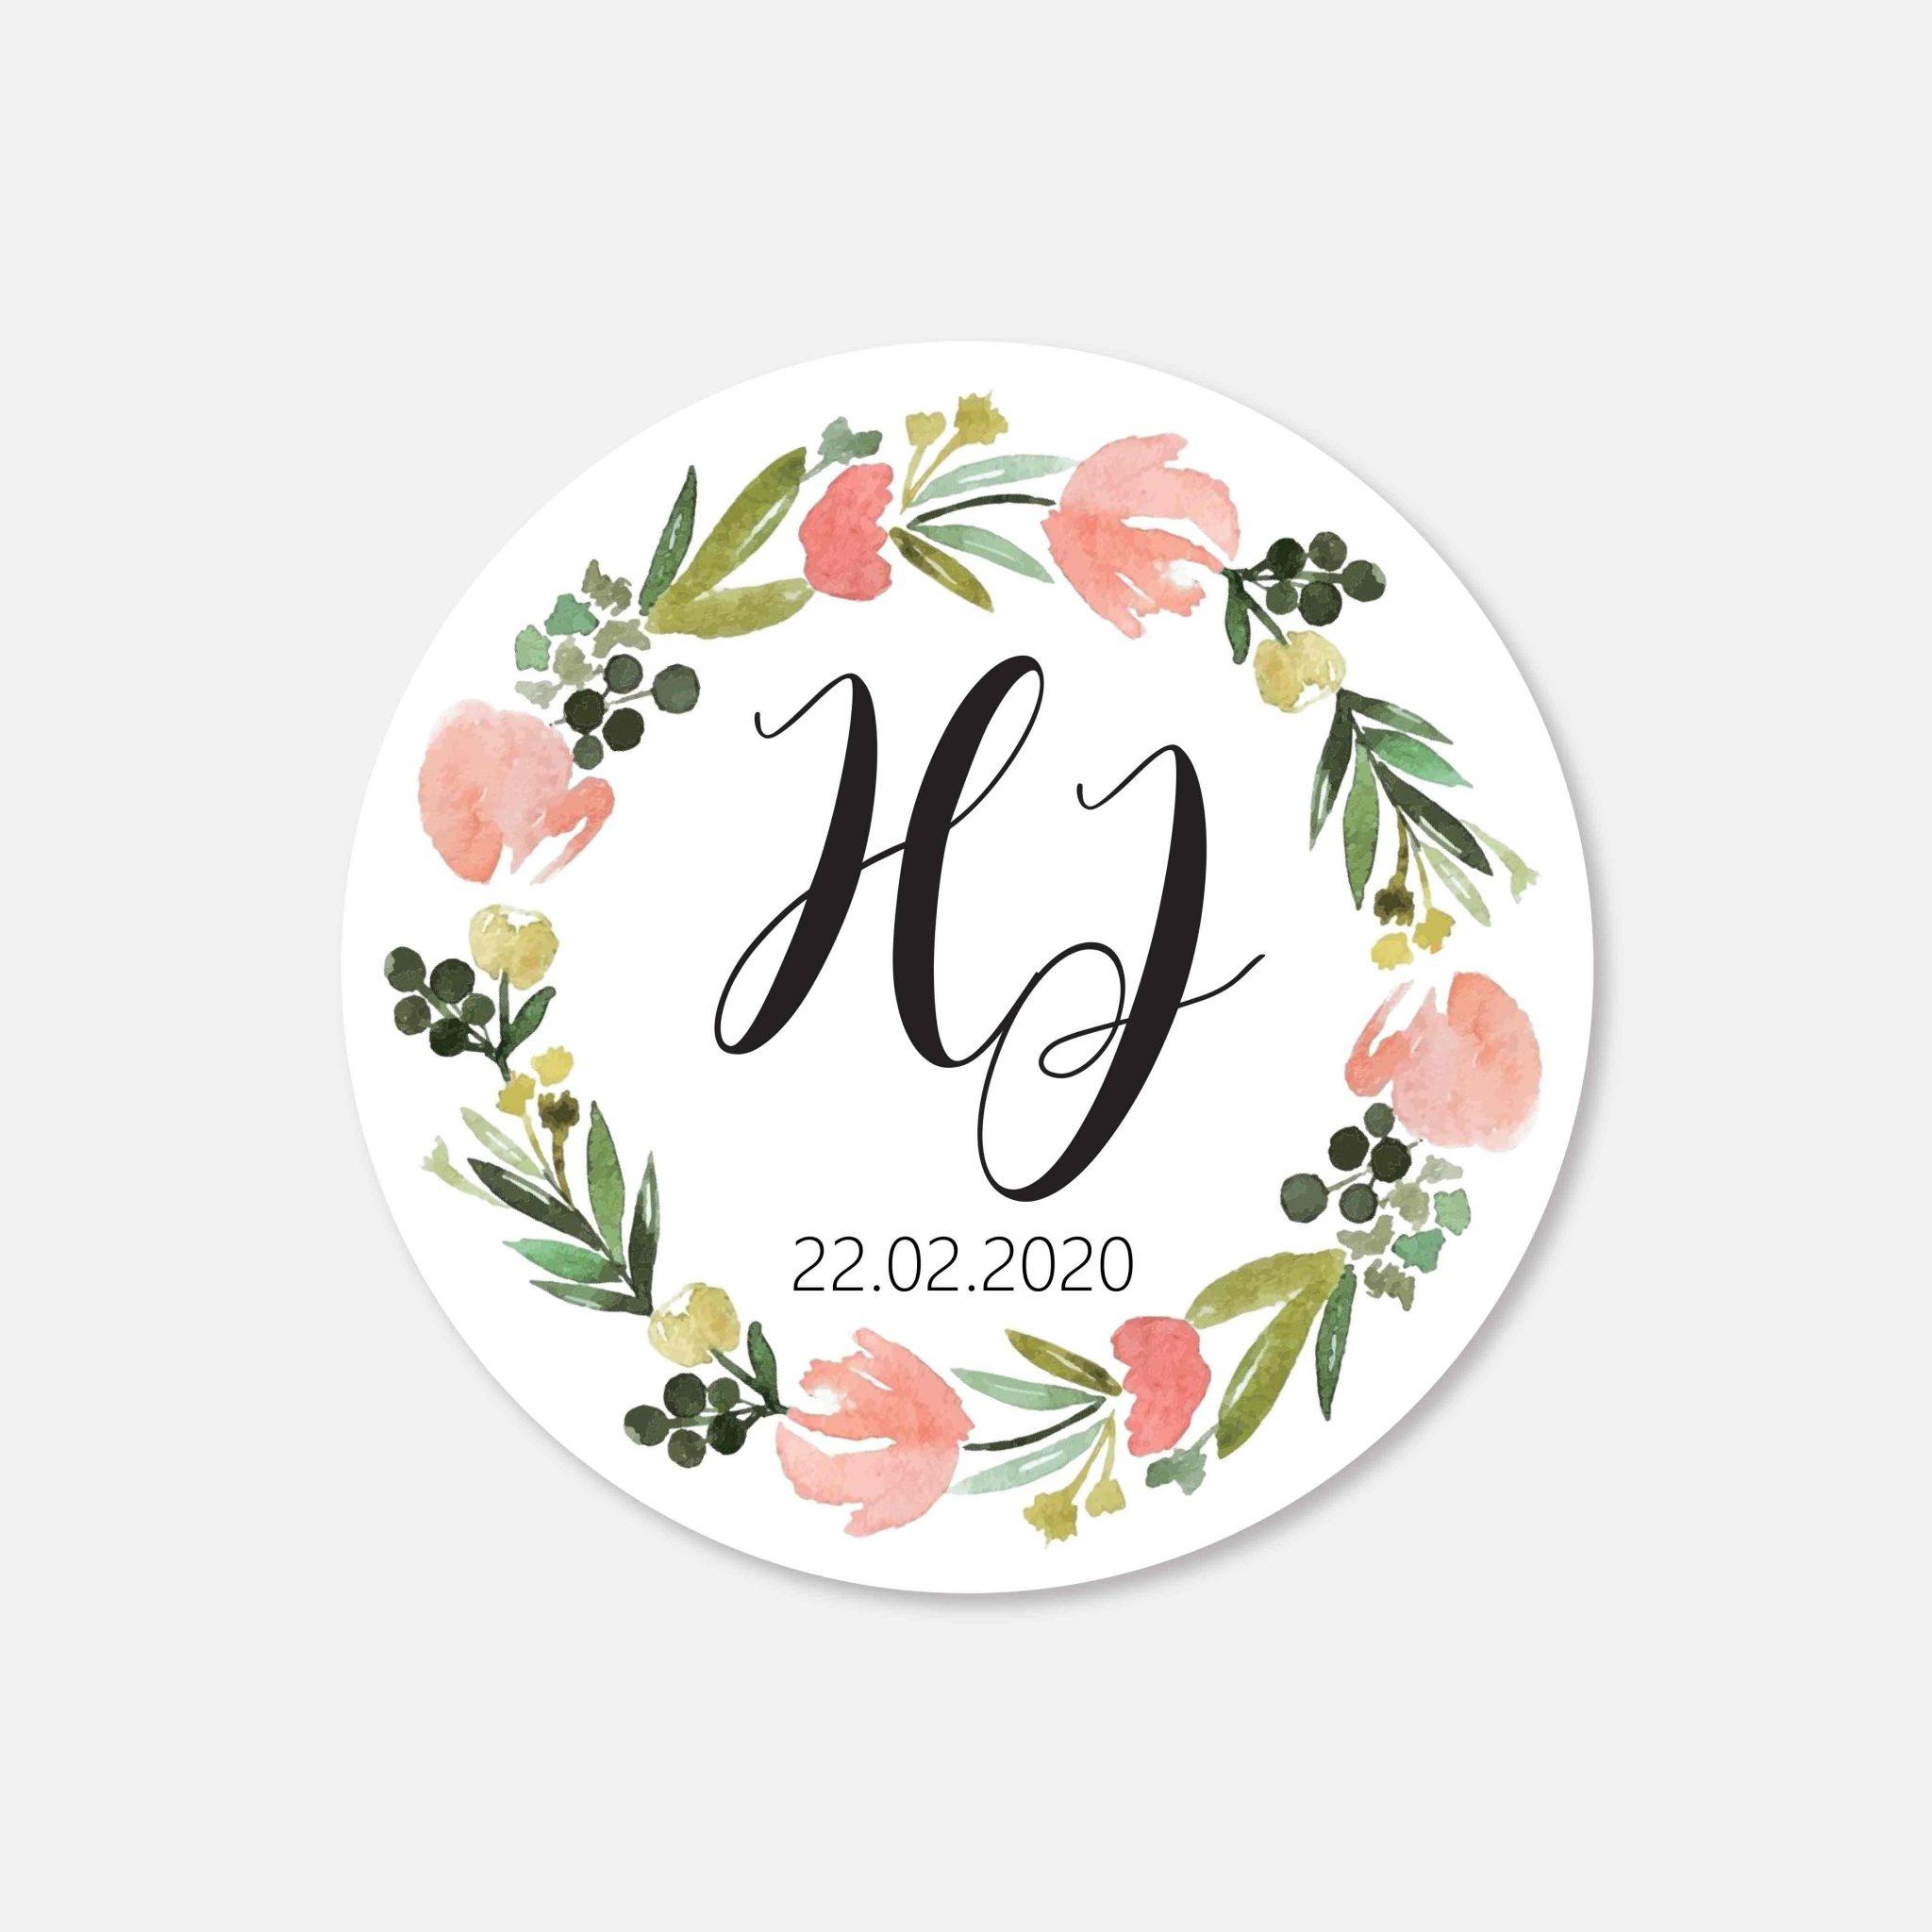 Stickers 2